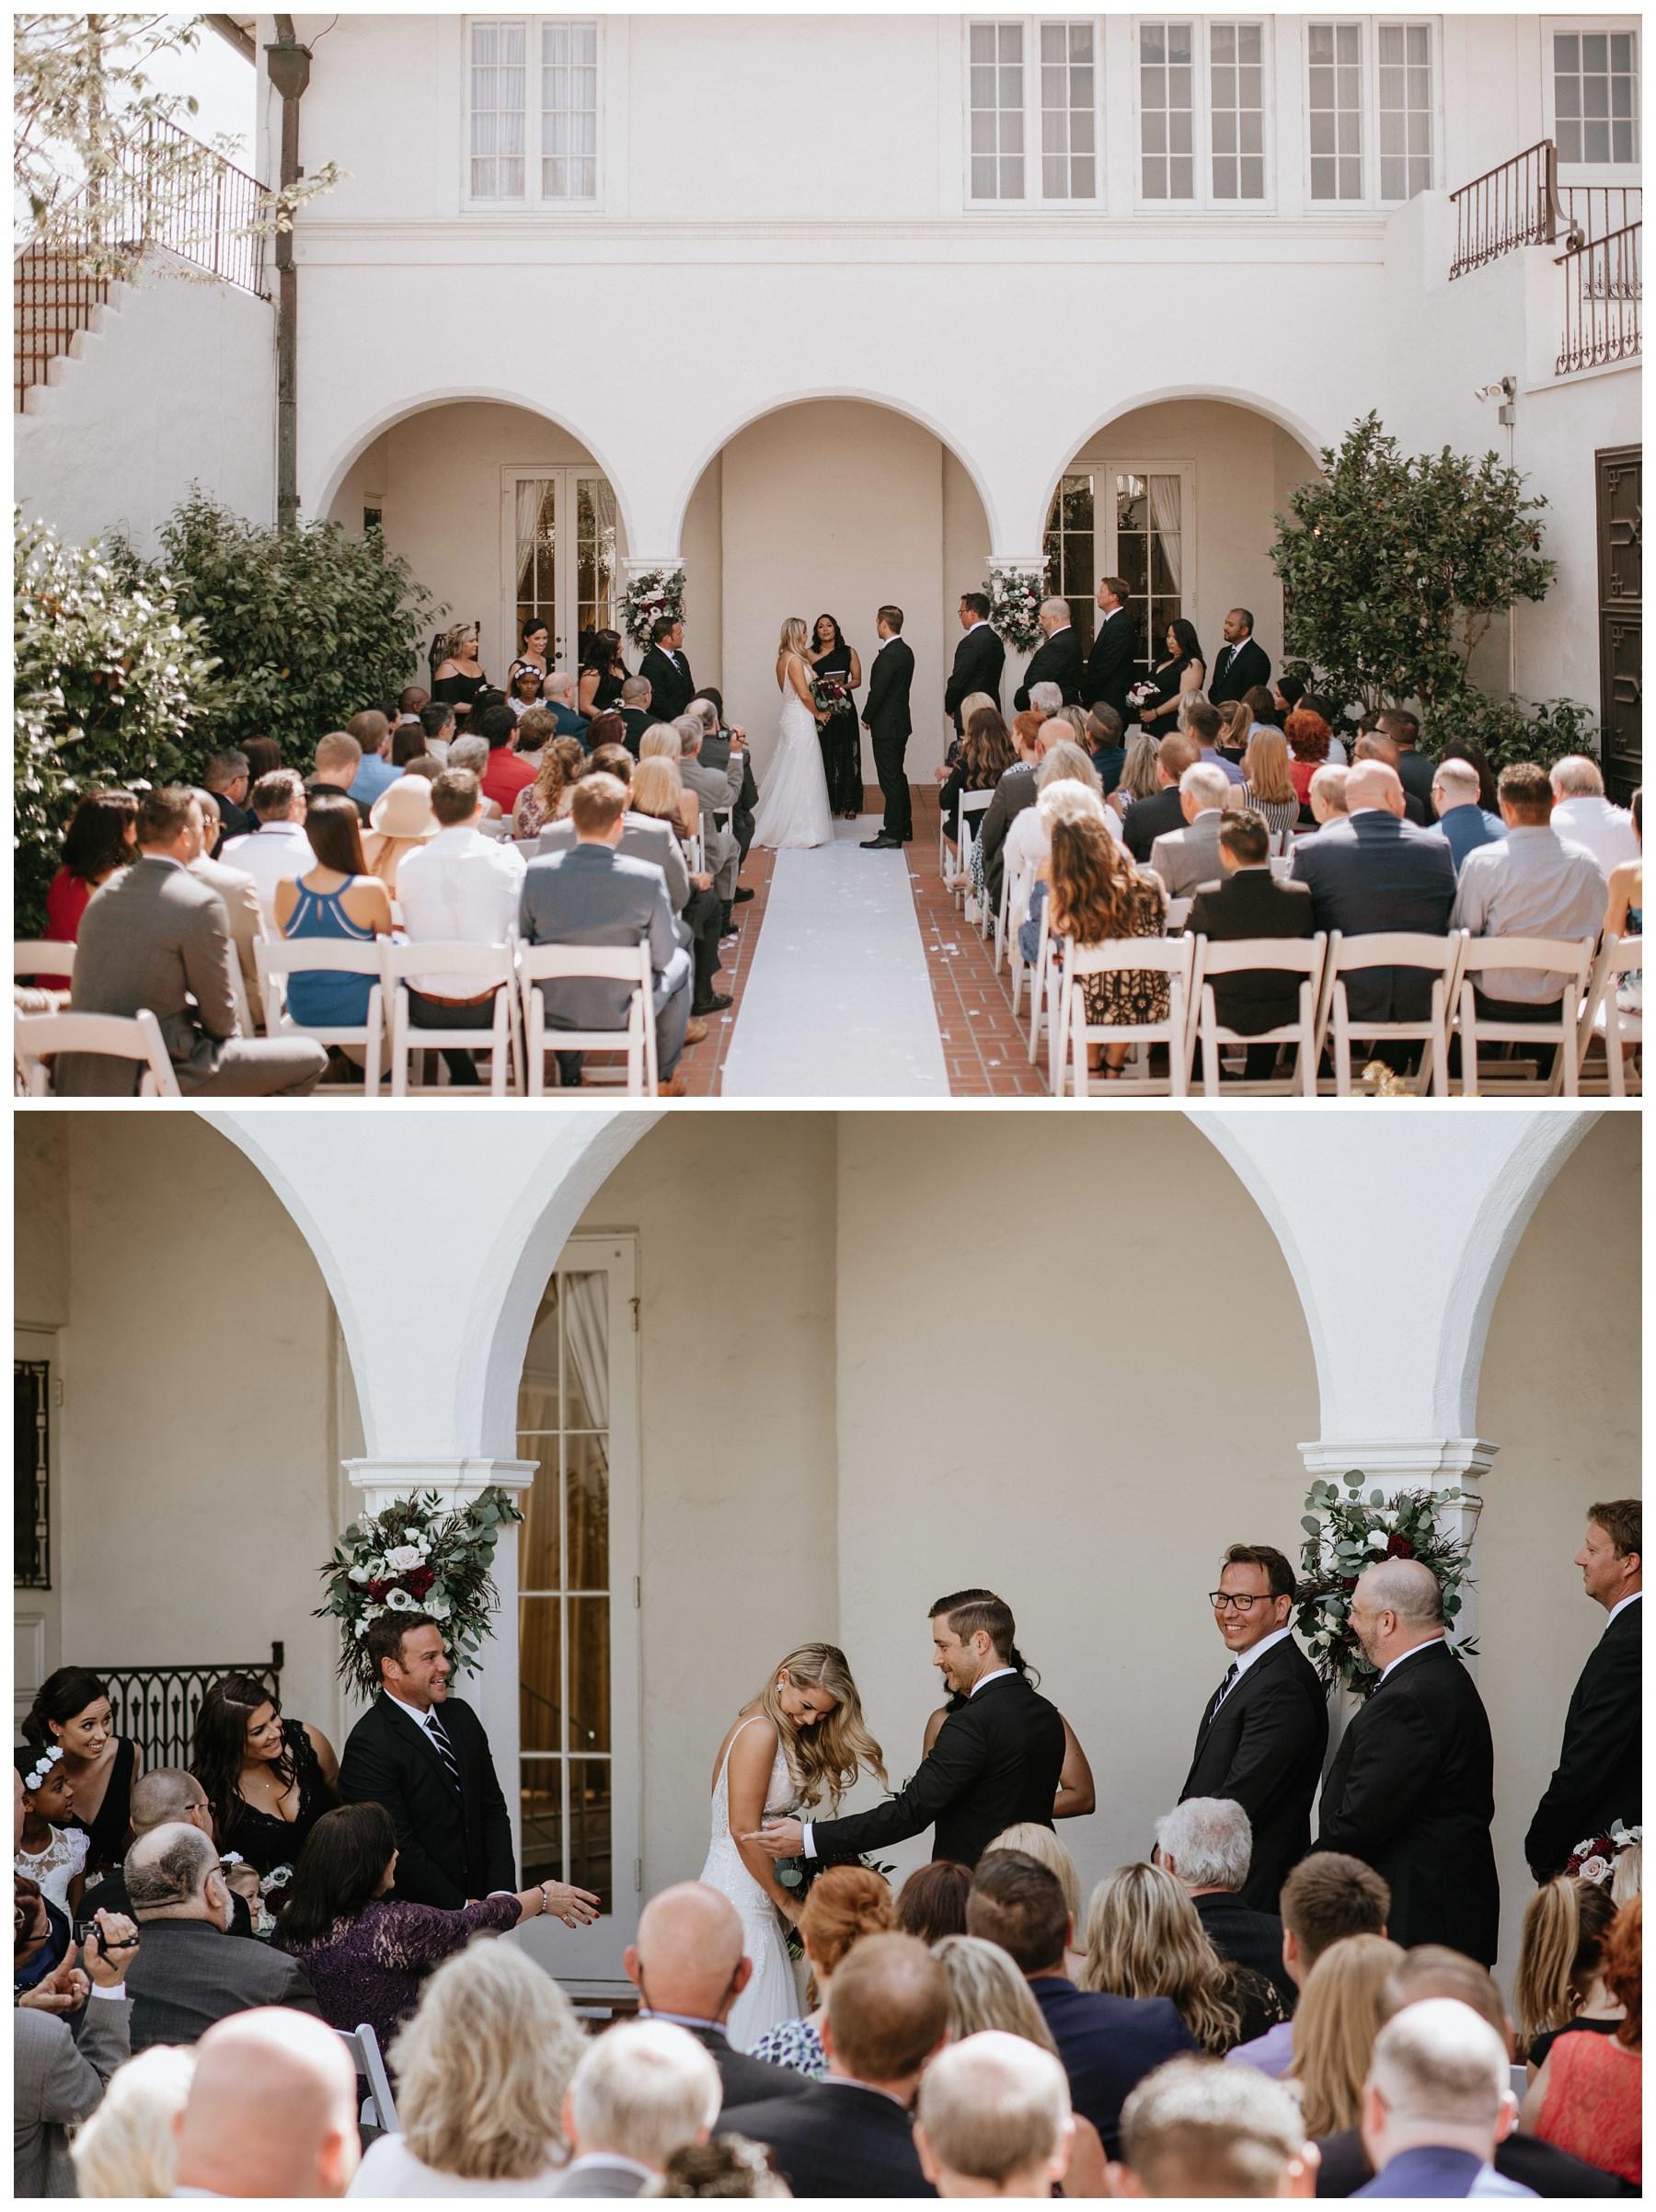 Darlington_House_Wedding_0024.jpg